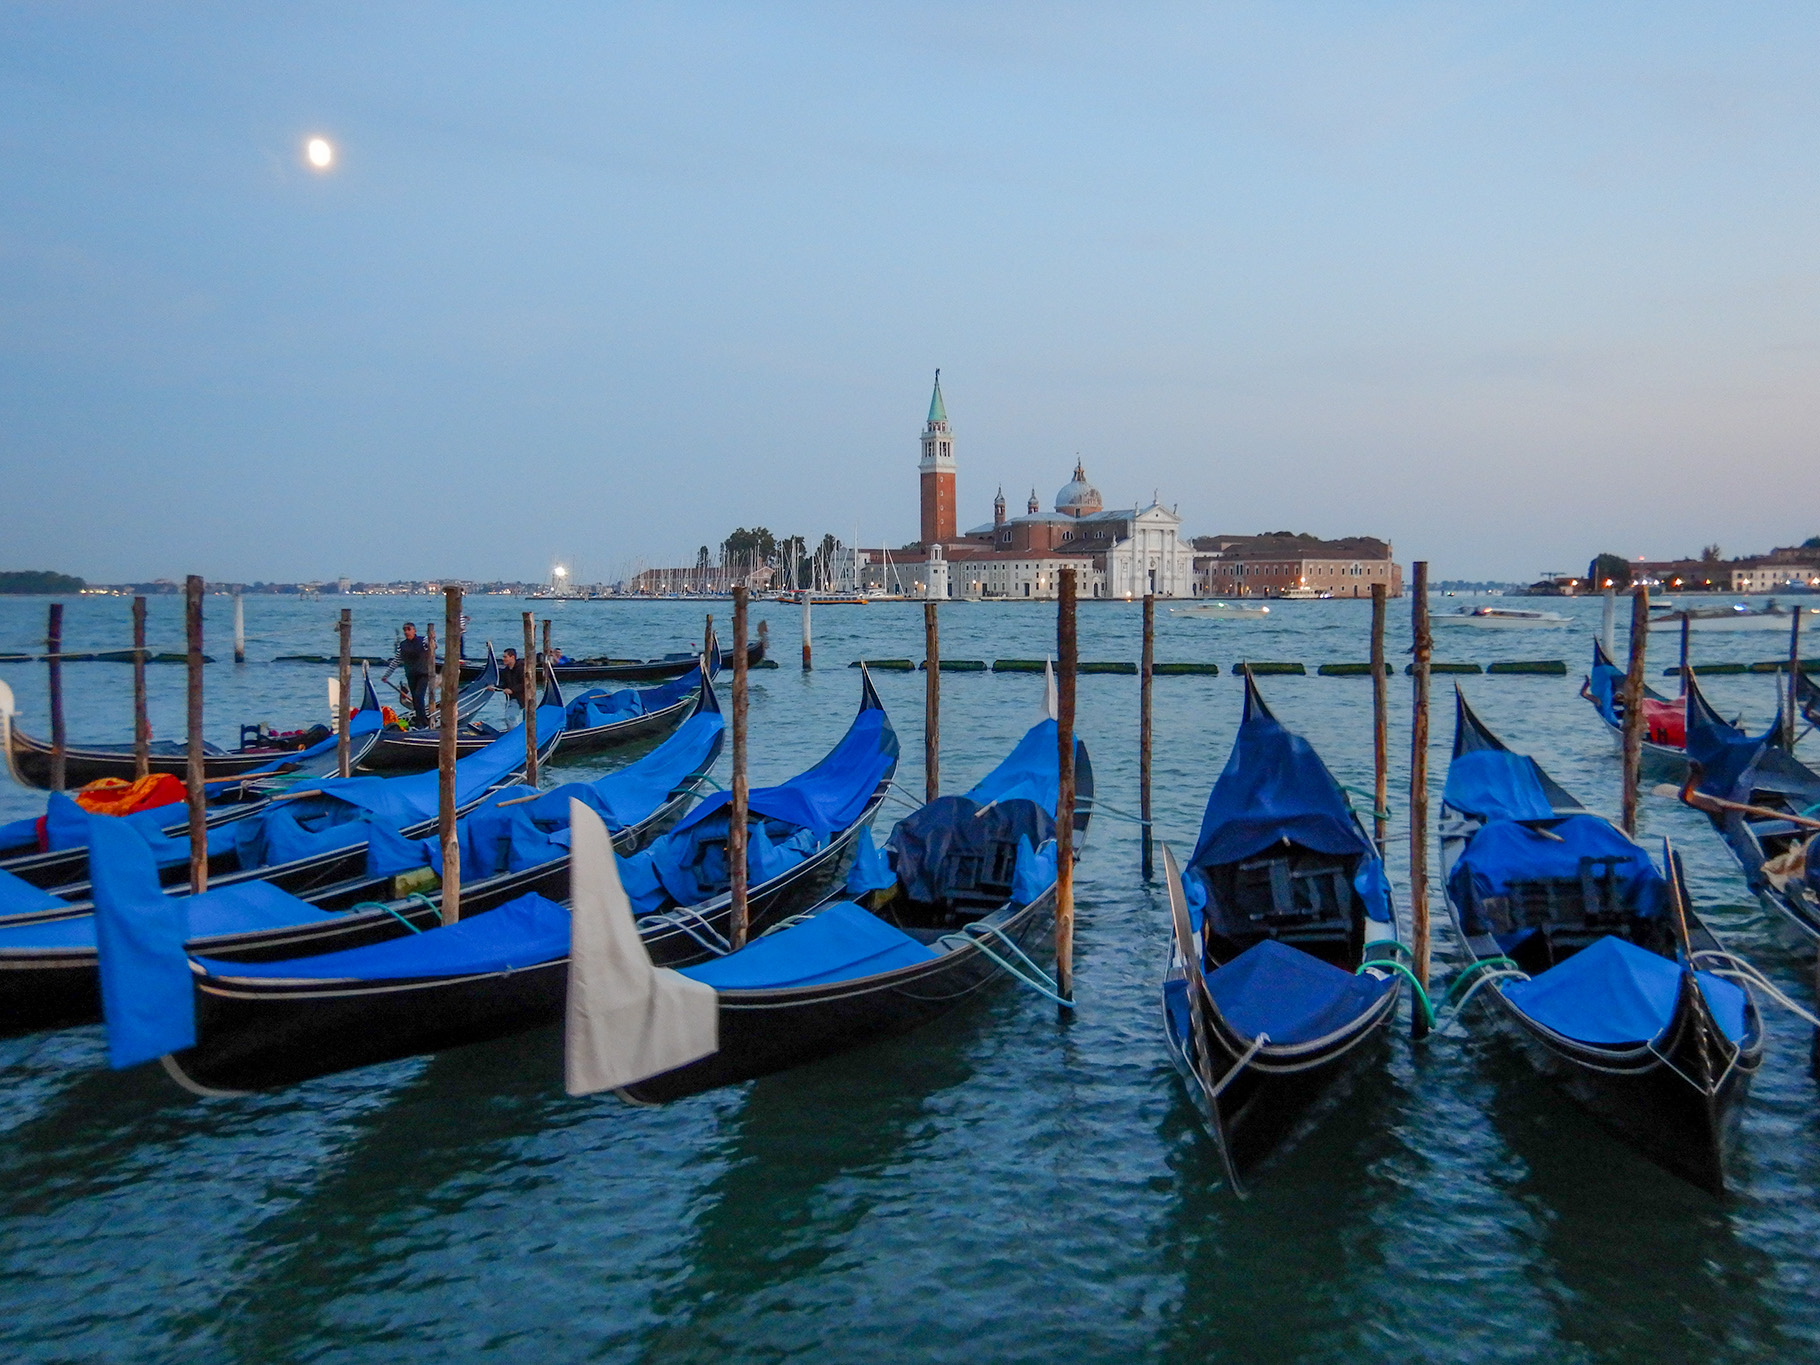 20171002 - Venice - 528.jpg